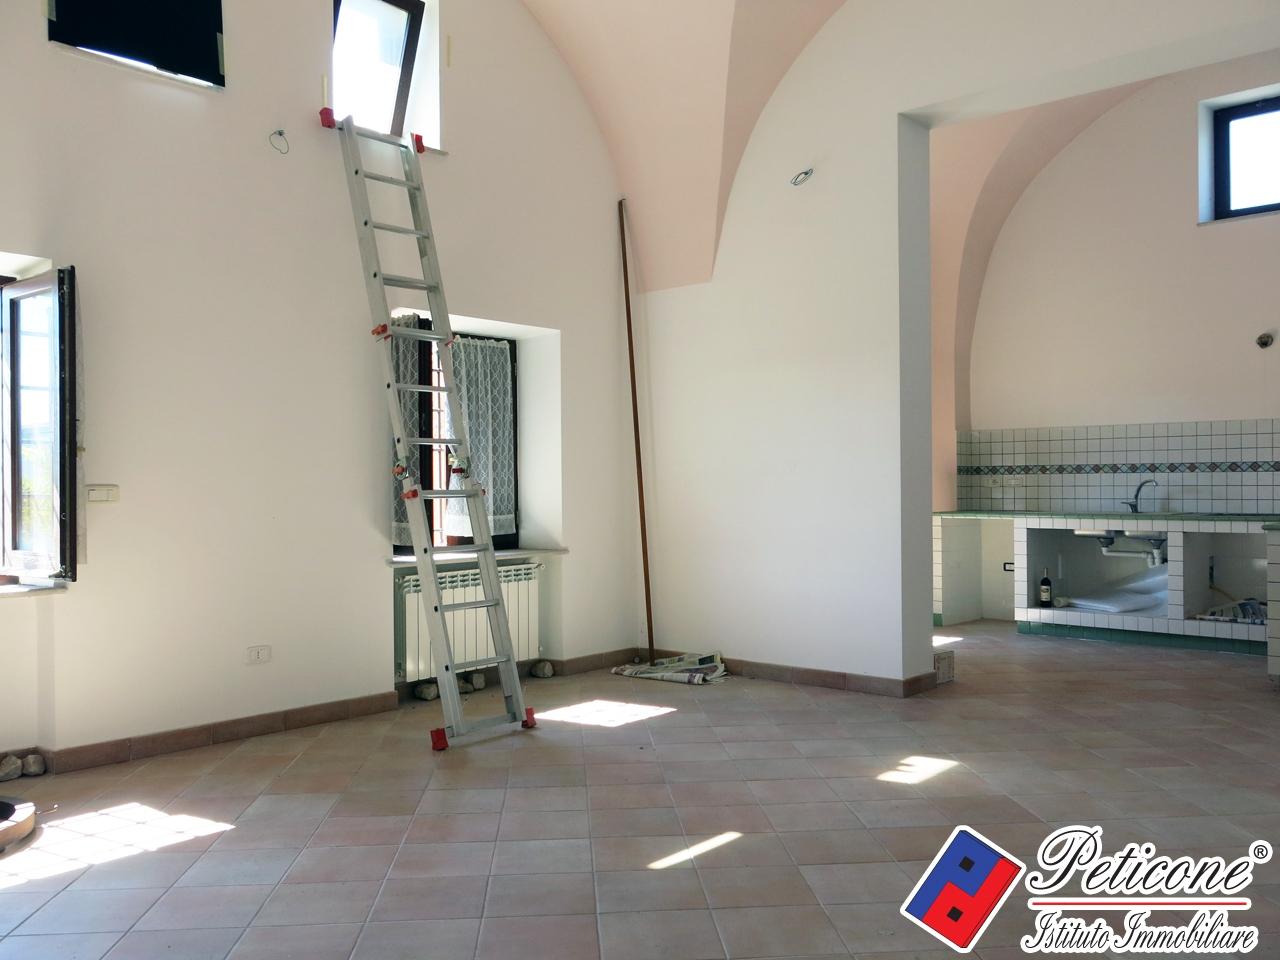 Villa in Vendita a Gaeta: 5 locali, 250 mq - Foto 5